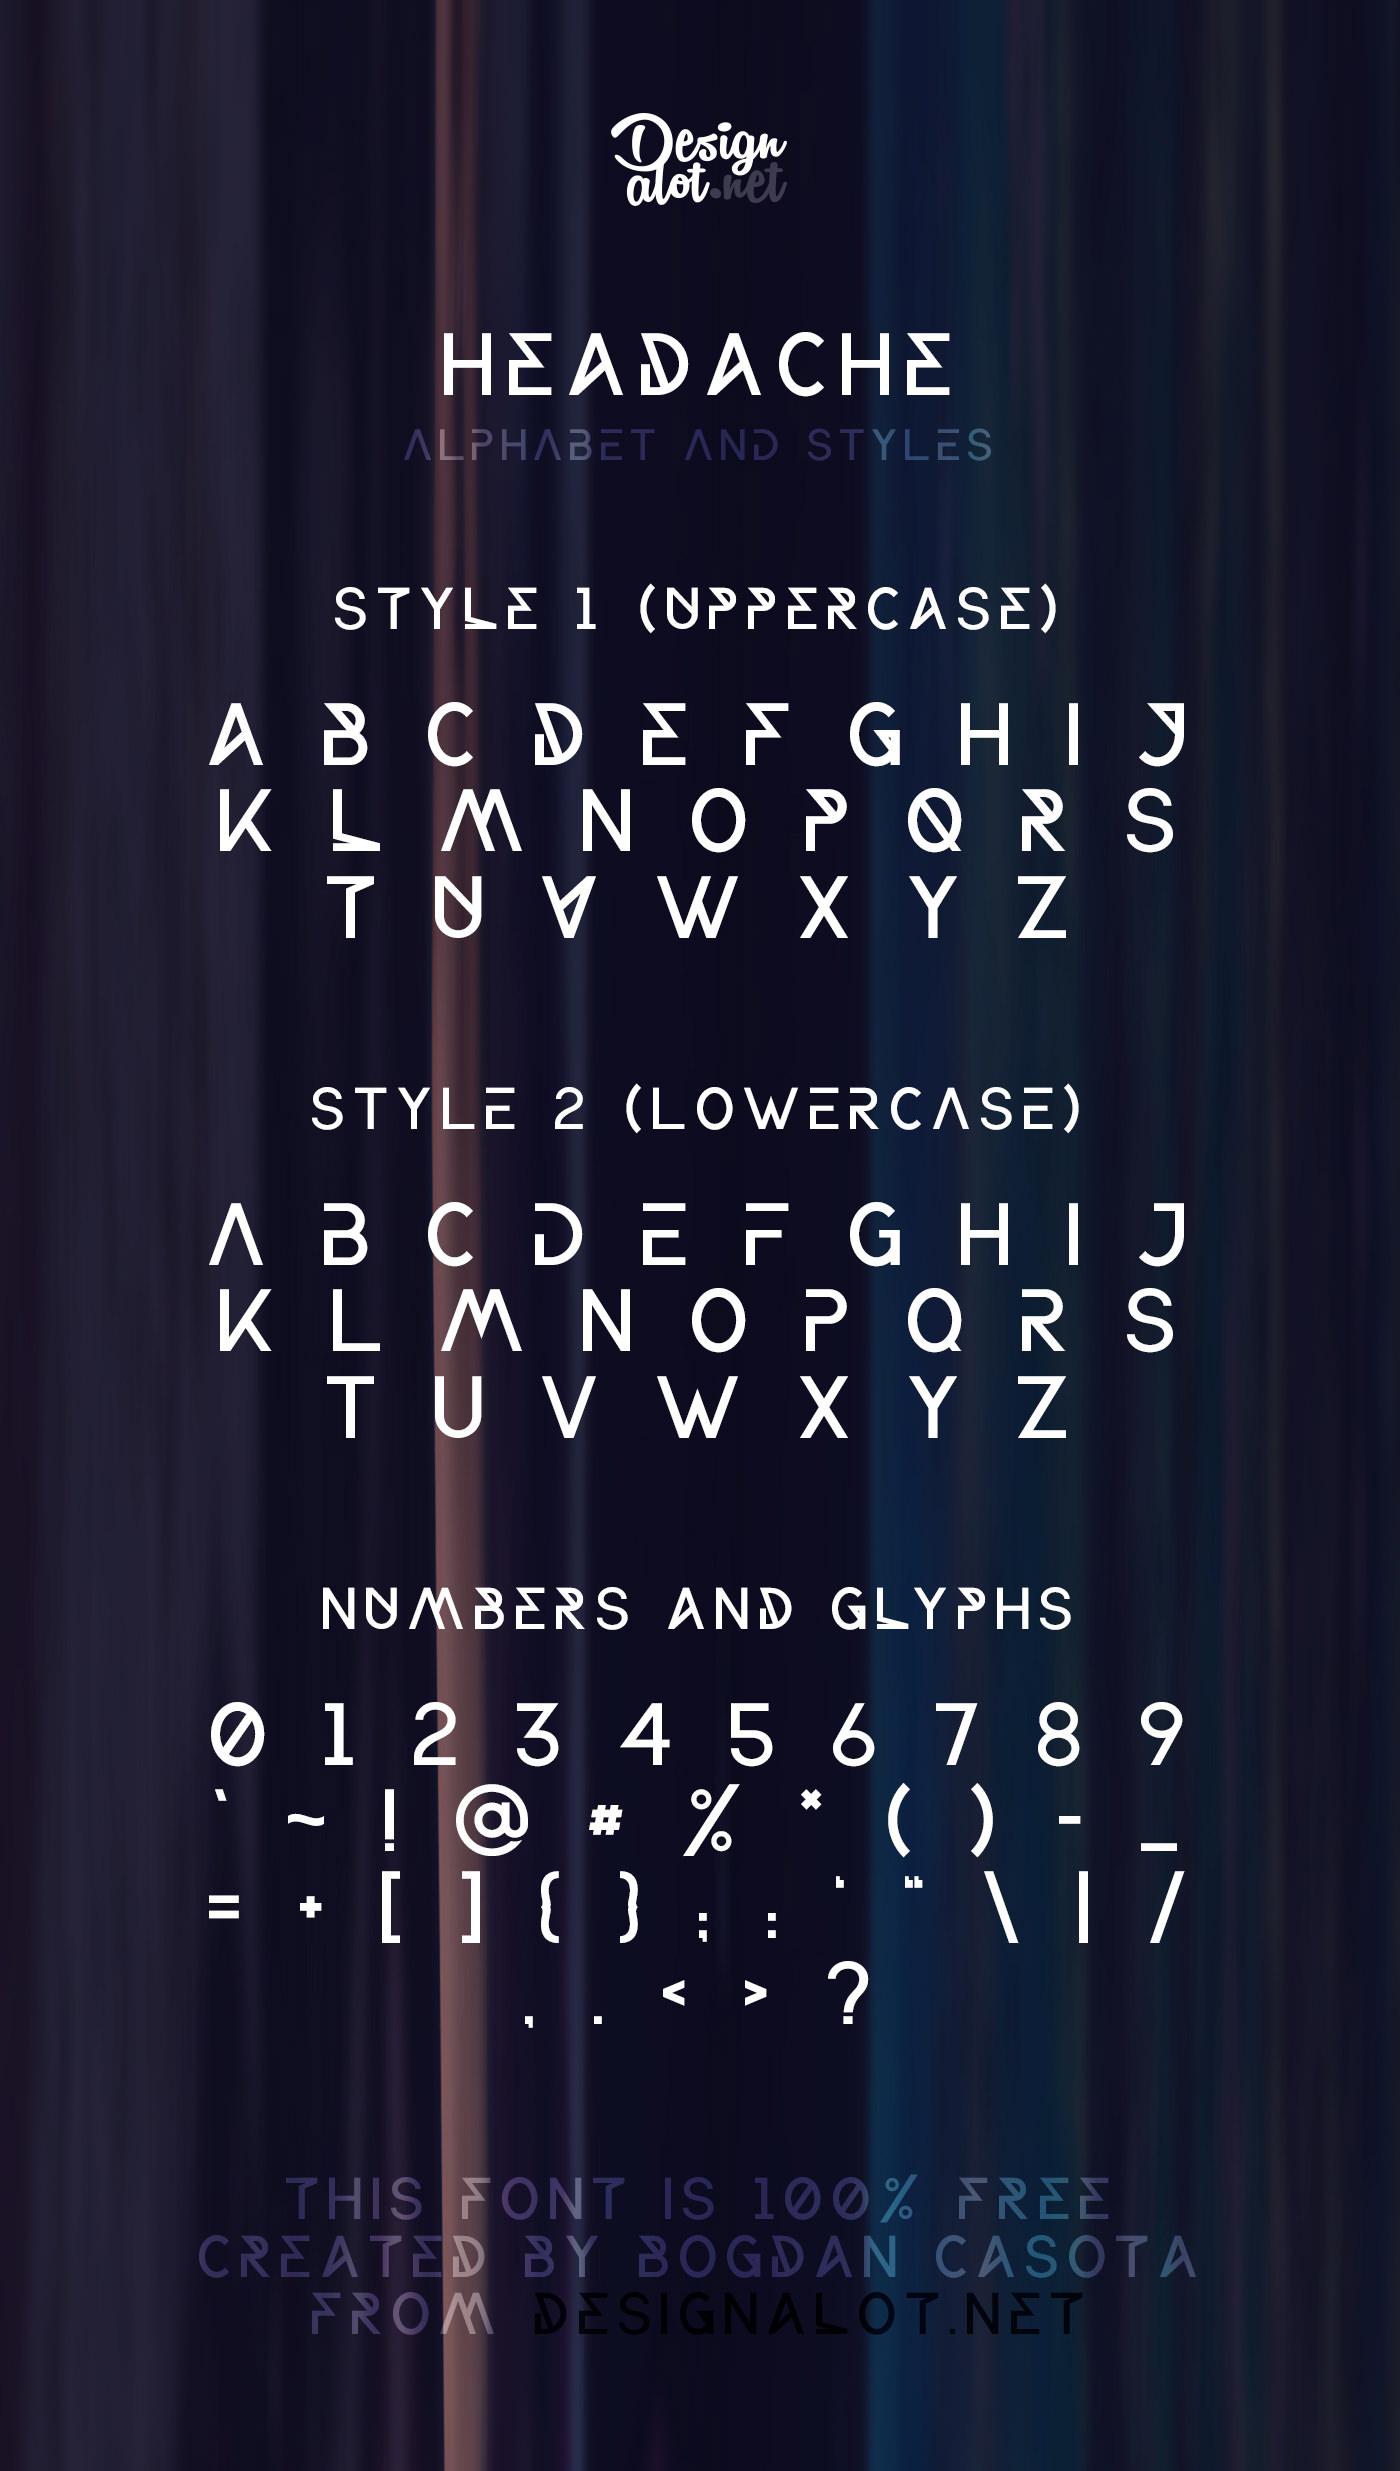 headache-free-font-preview